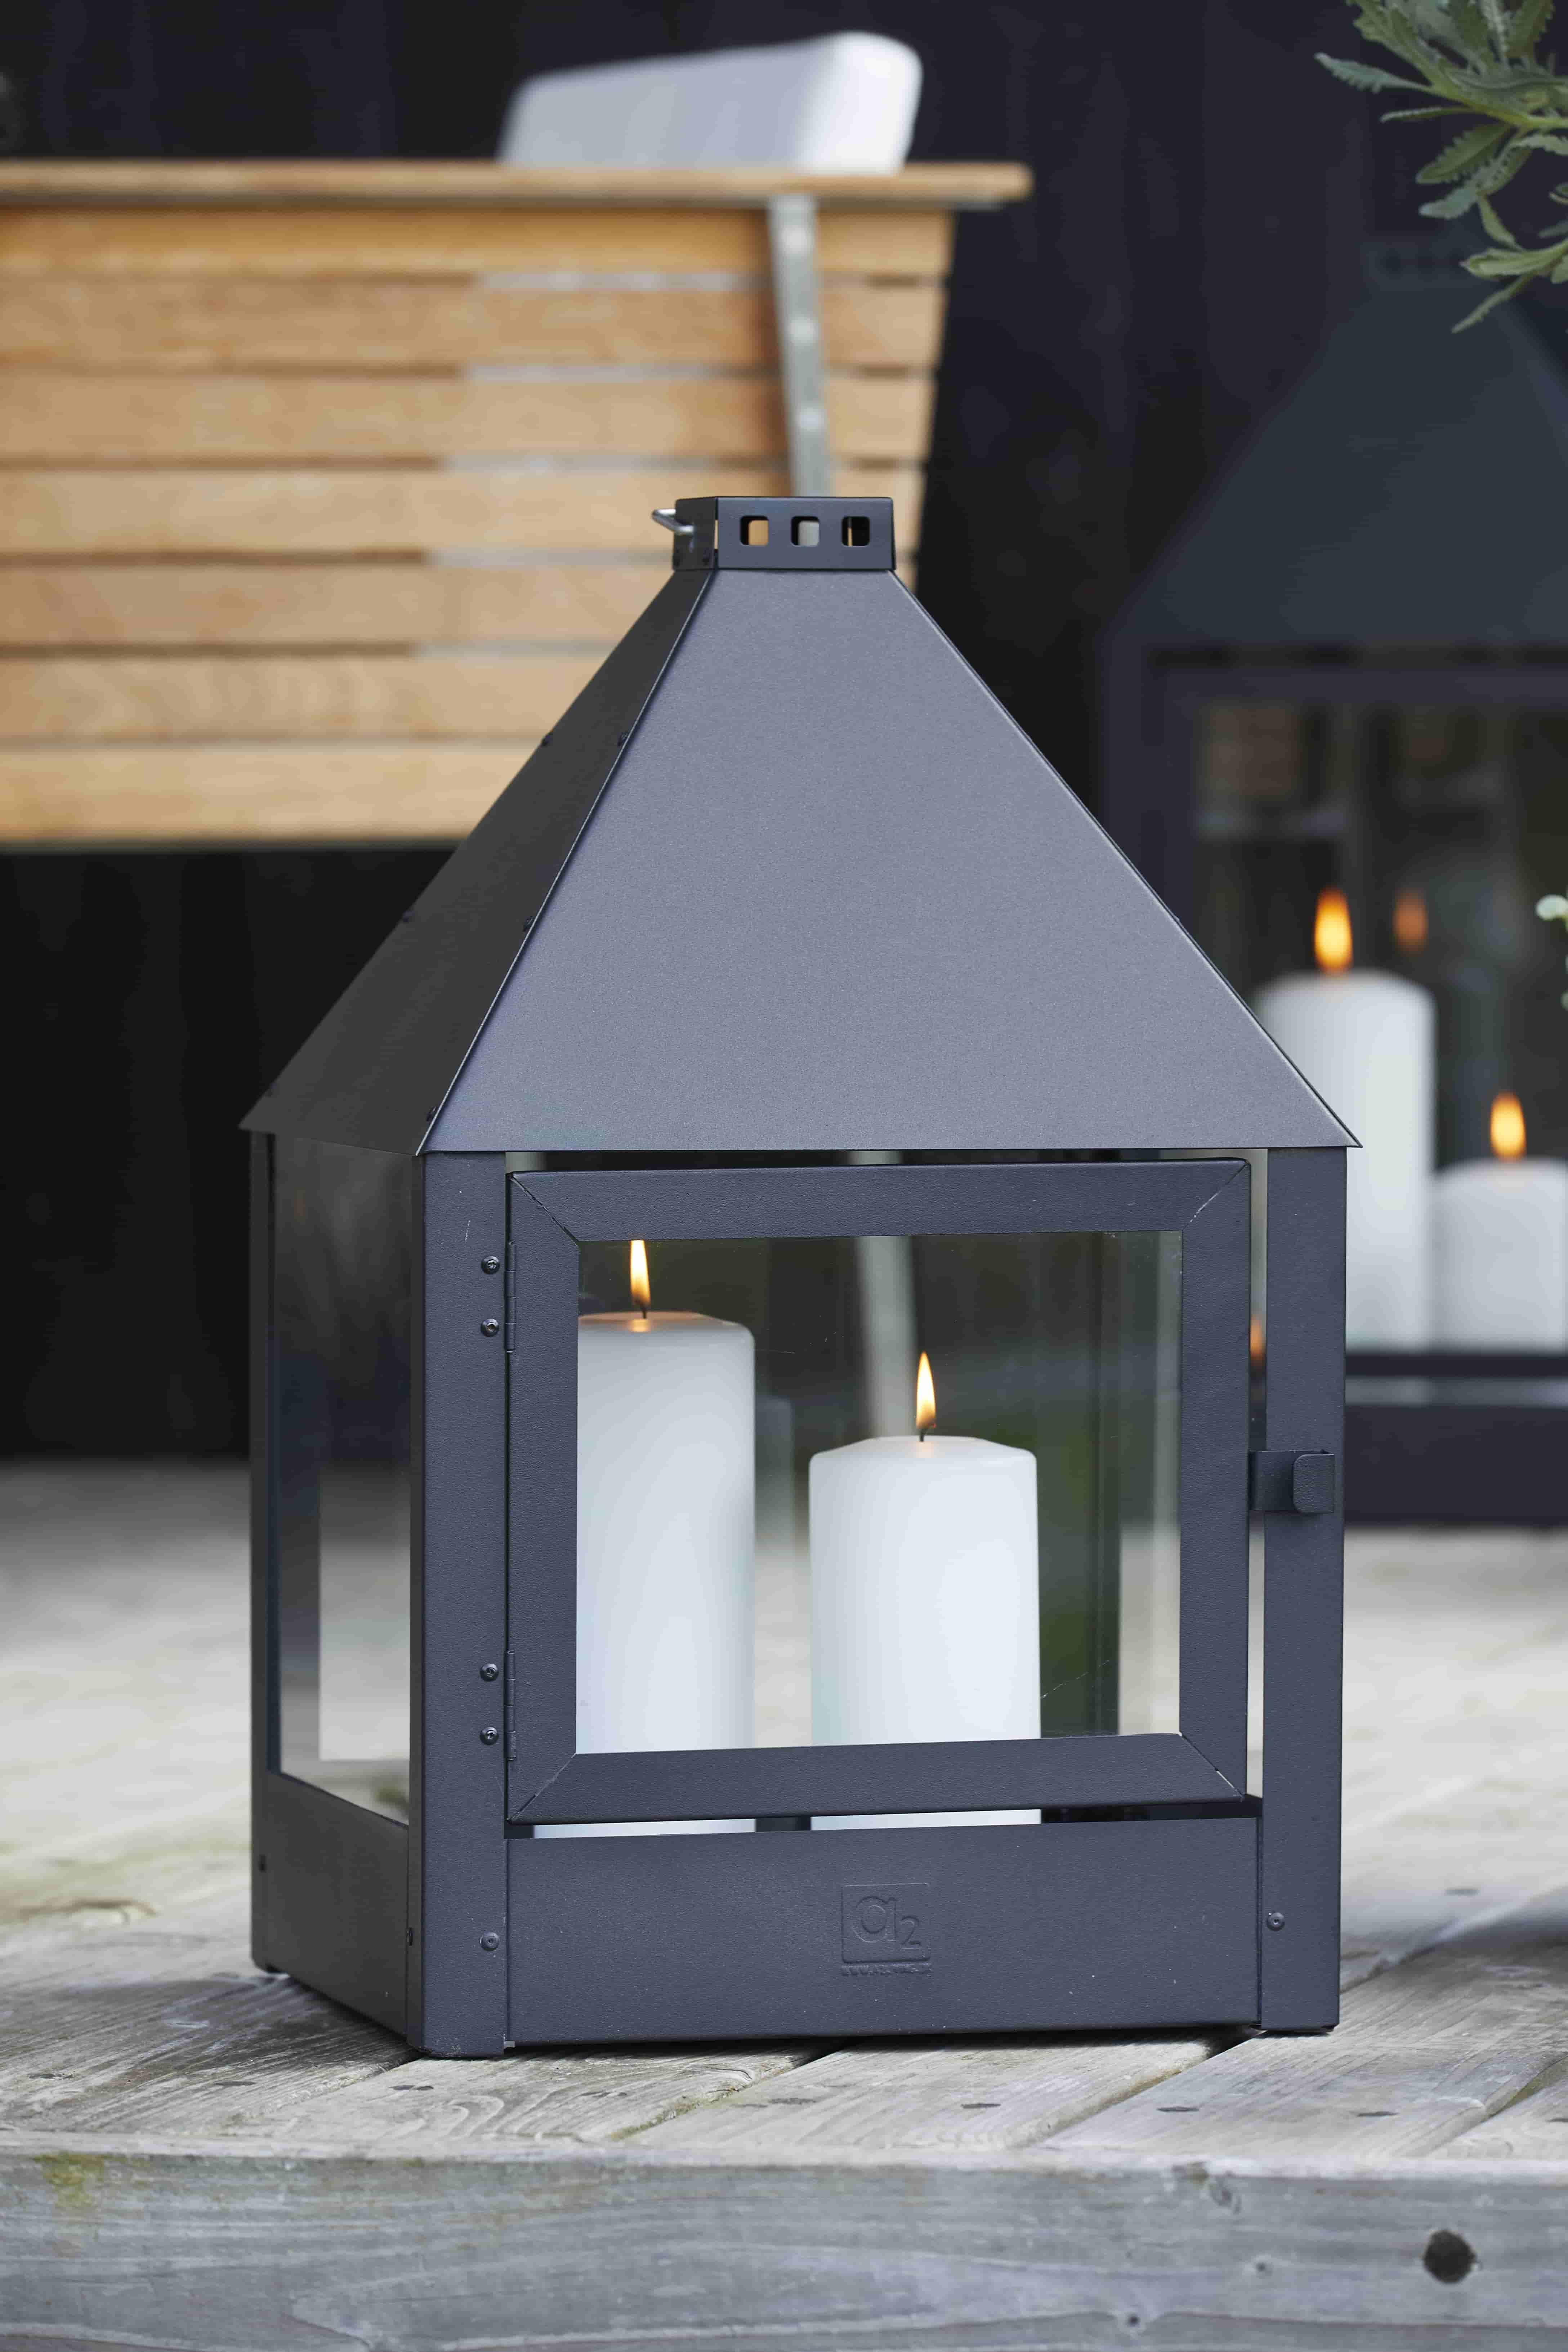 A2 living mega quadro lanterne - mat sort, galvaniserede (32x52) fra a2 living fra boboonline.dk